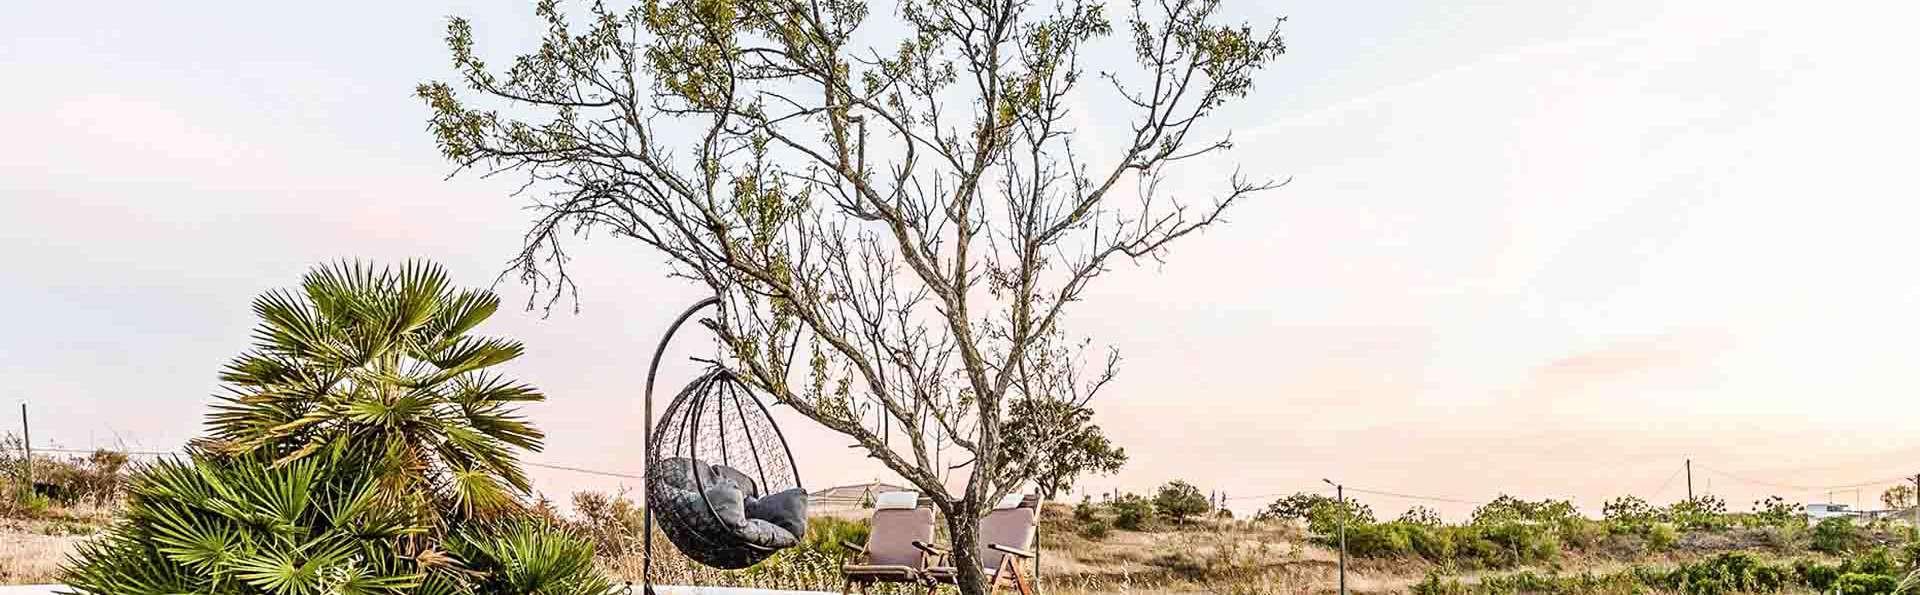 Escapada relax en suite con Jacuzzi en un oasis de romanticismo a dos pasos de Praia Verde